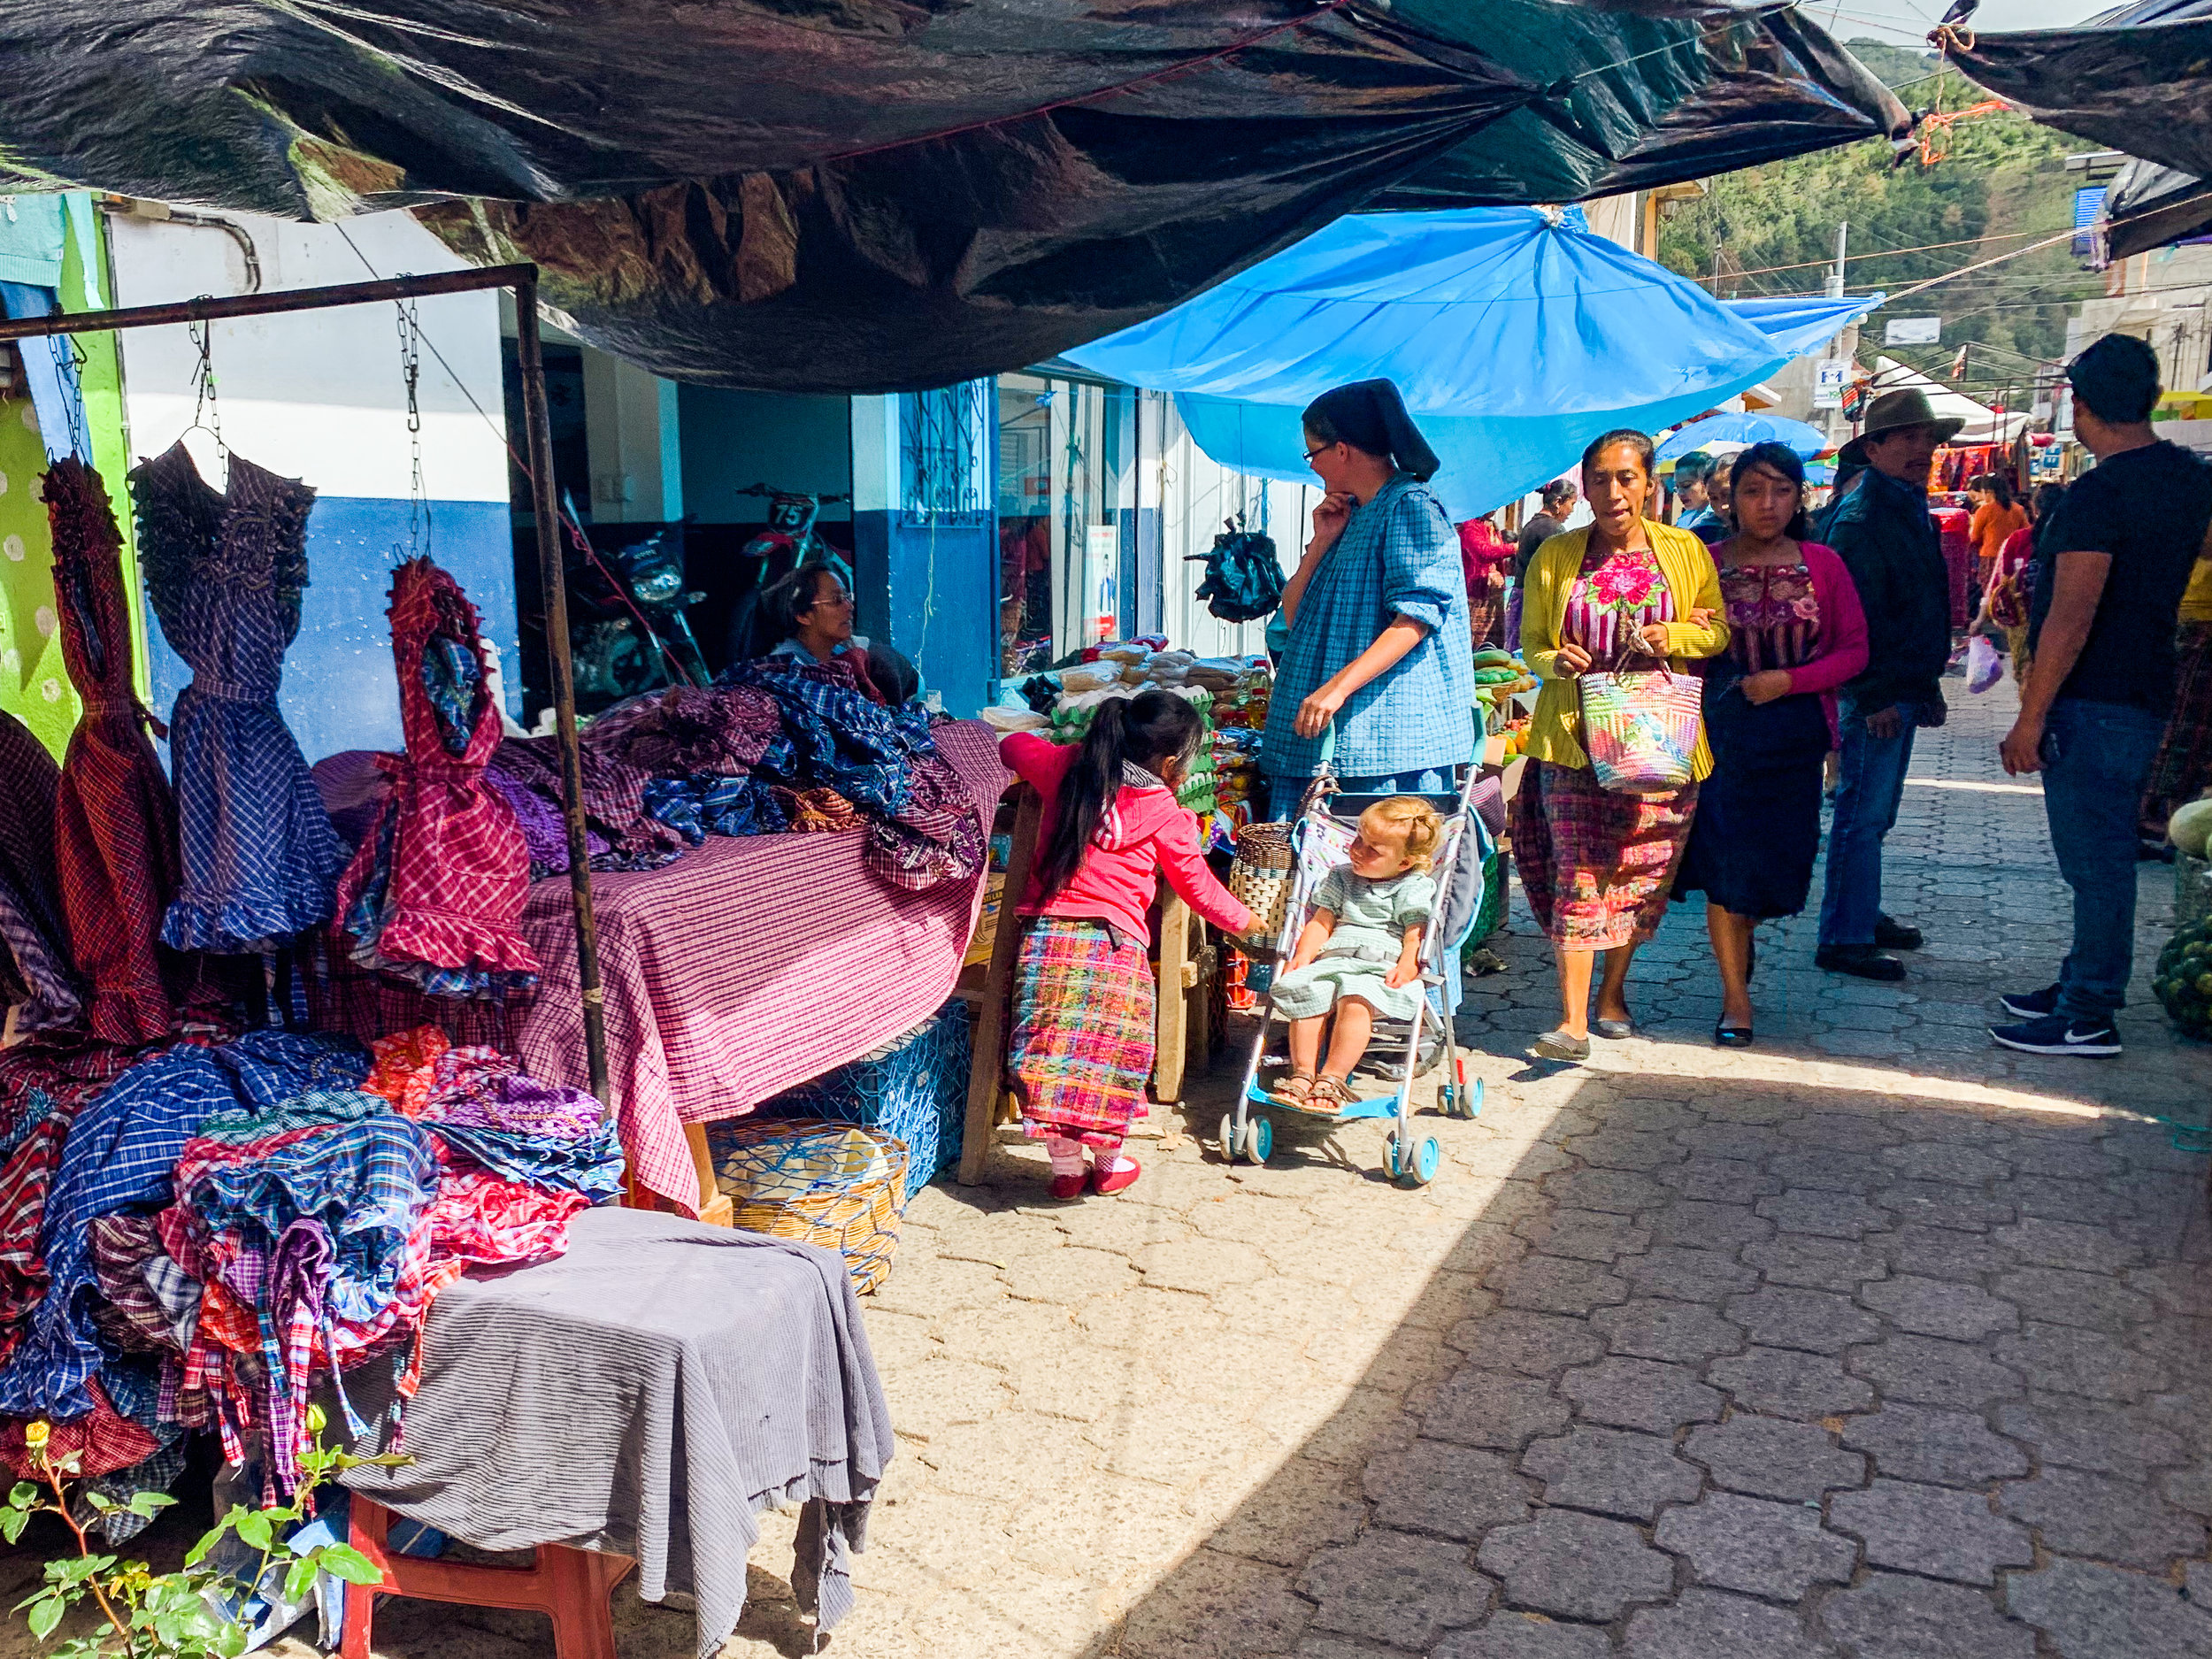 Tecpan Guatemala market day mercado Misty Prochaska iPhone XS-13.jpg